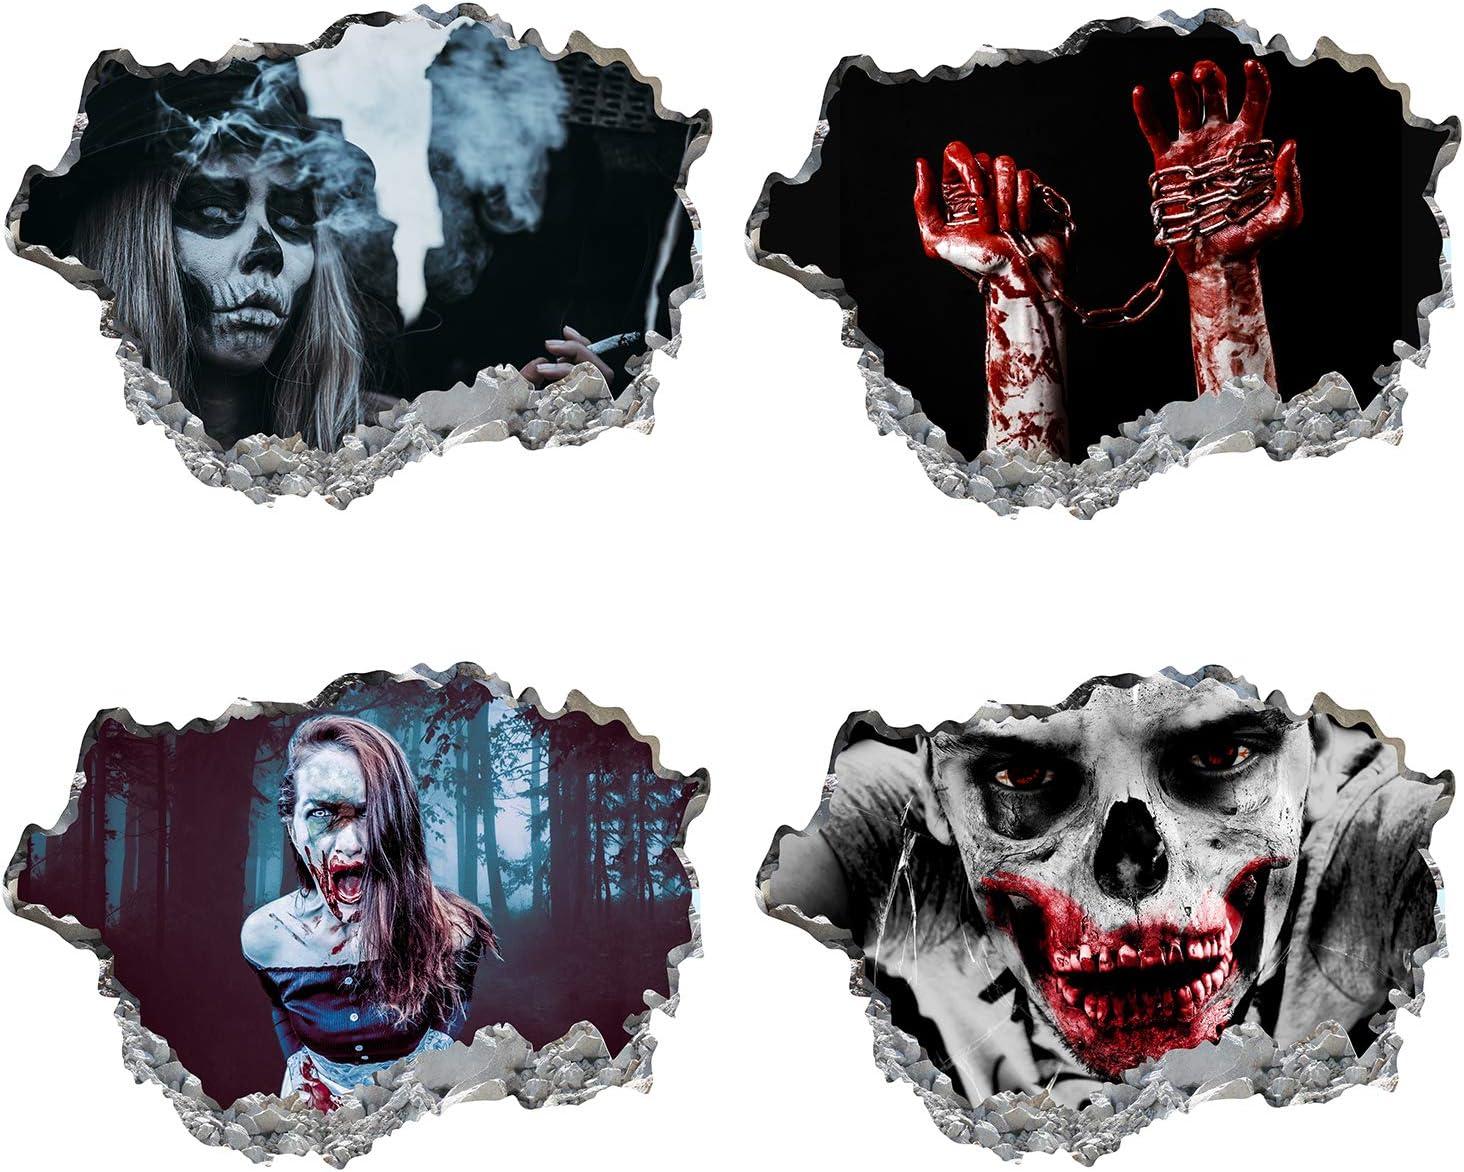 Halloween Creepy Horror Ghost 3D Wall Art Stickers Vinyl Mural Decal Party Decor